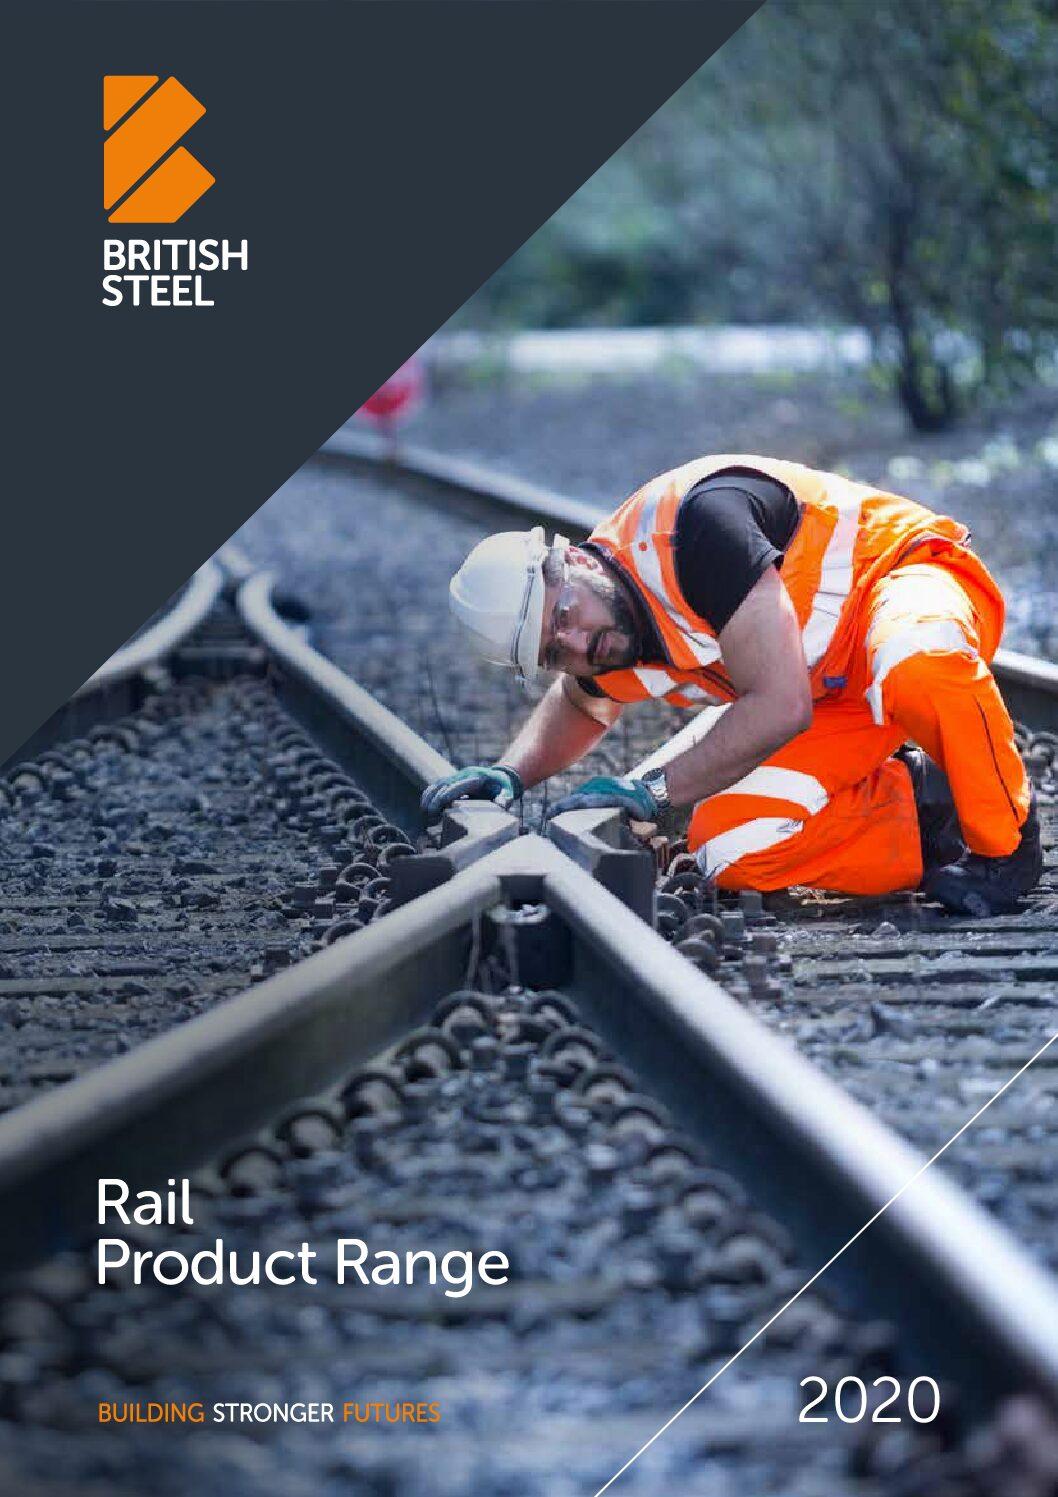 Rail Product Range